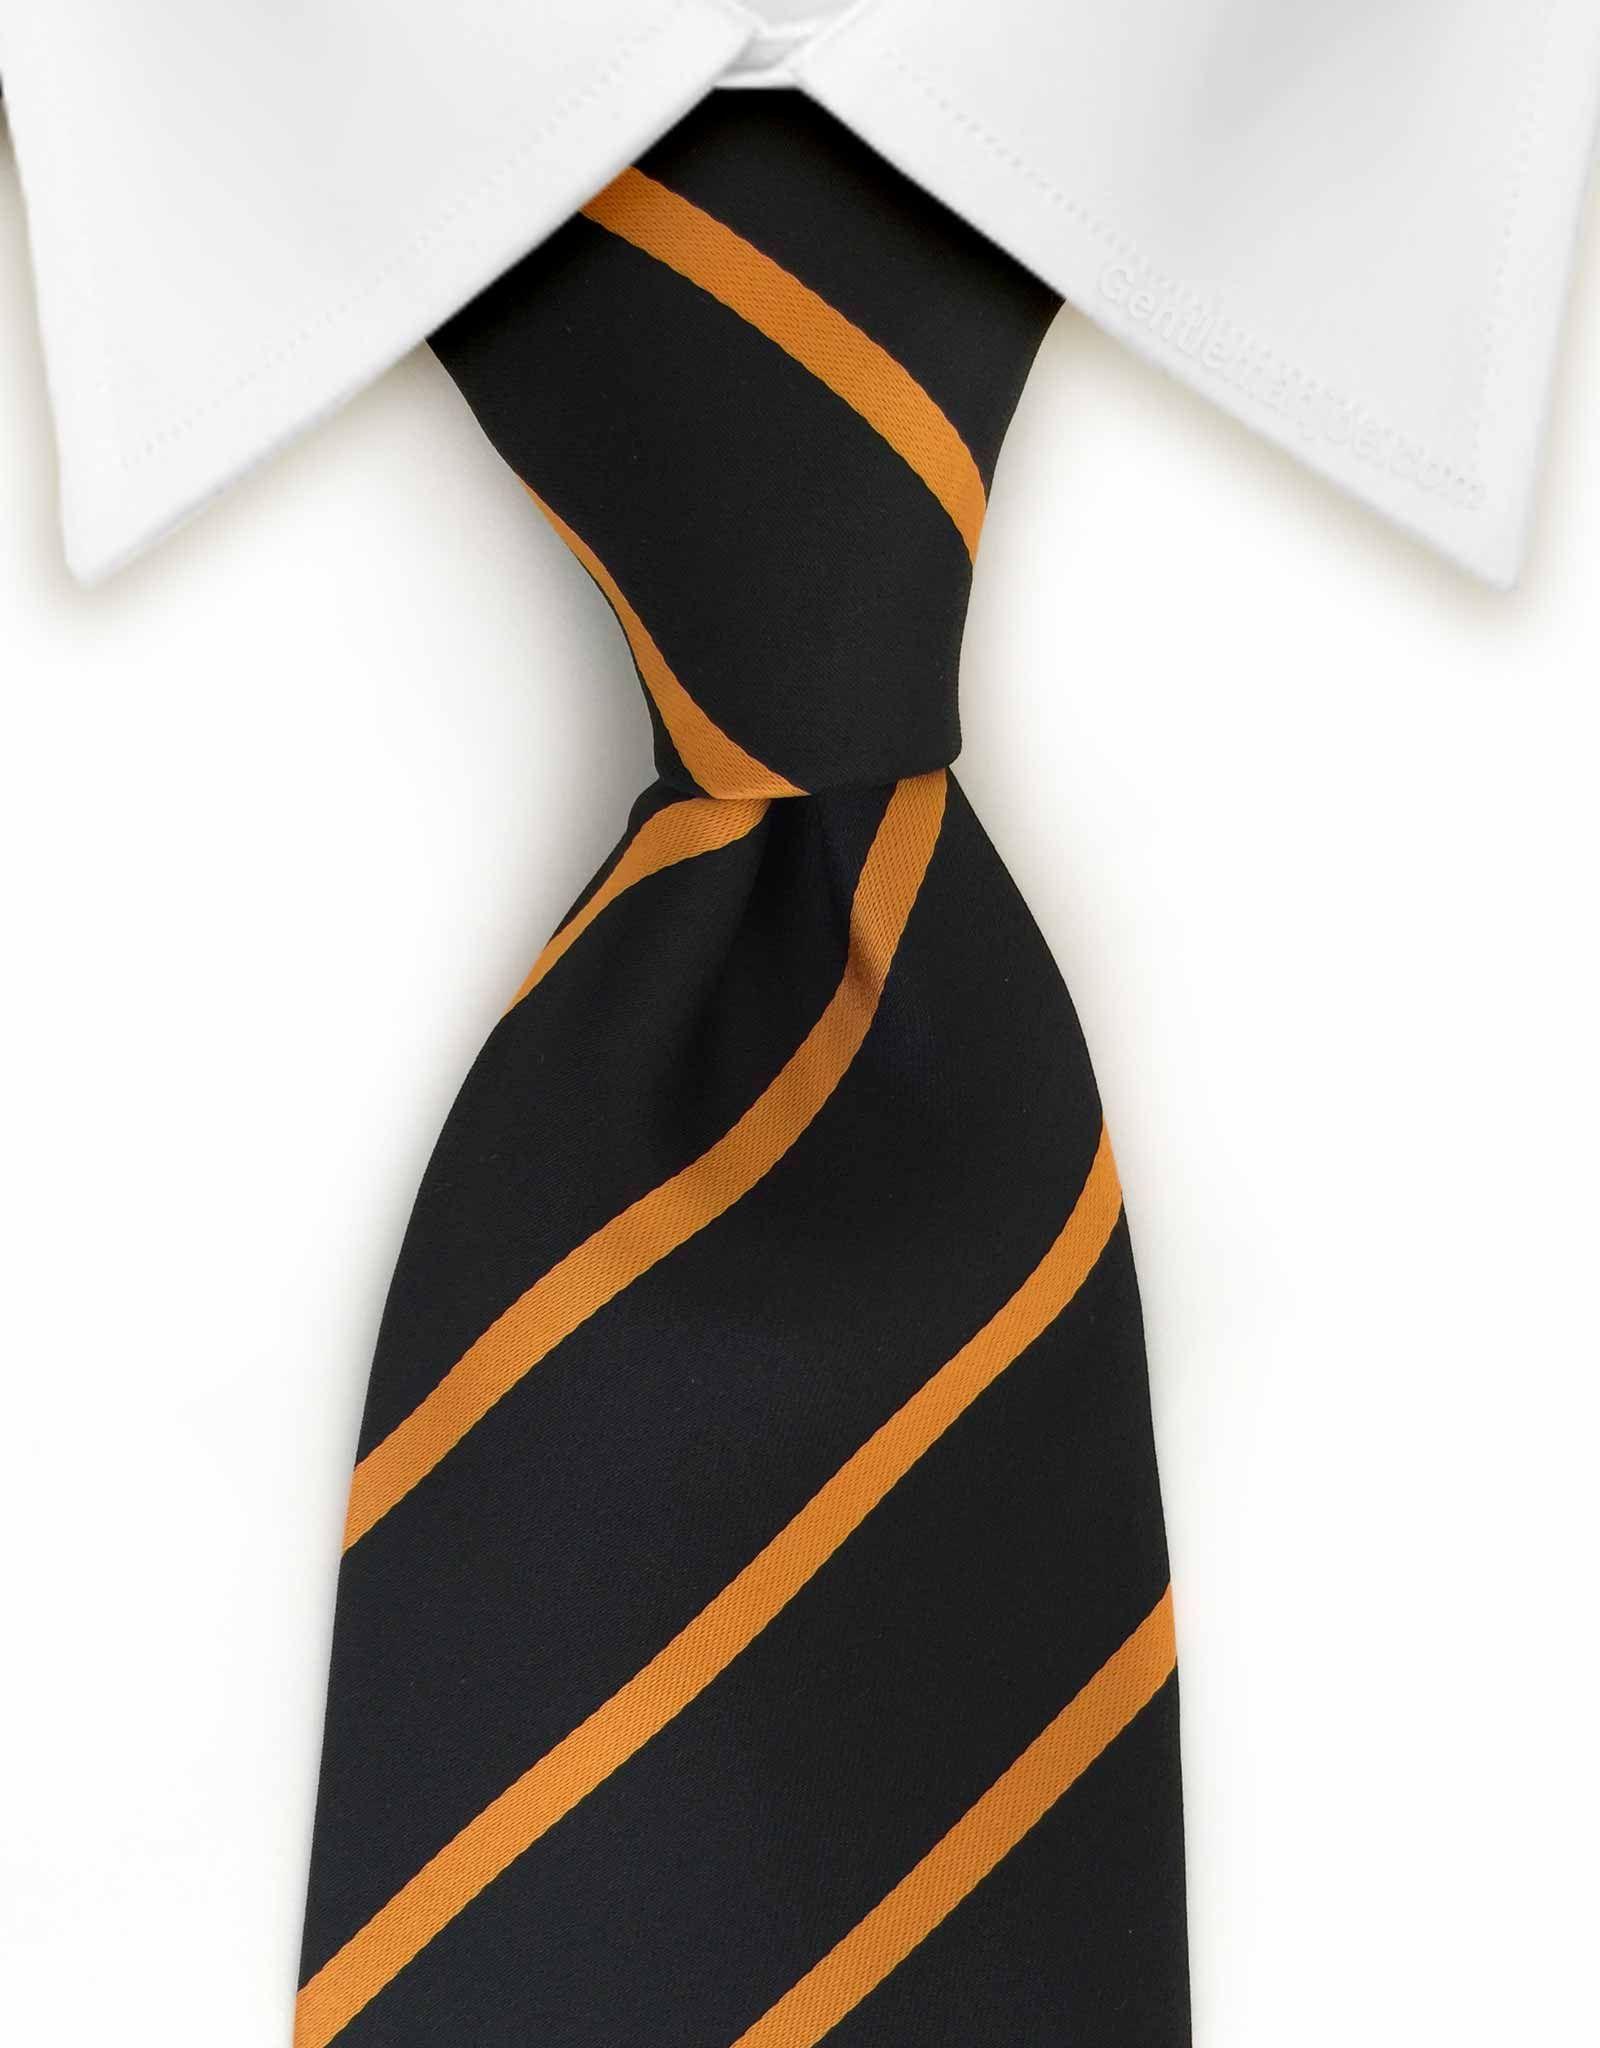 92aa91f88a14 Black & Orange XL Striped Tie | Splash The White Shirt | Tie, Black ...